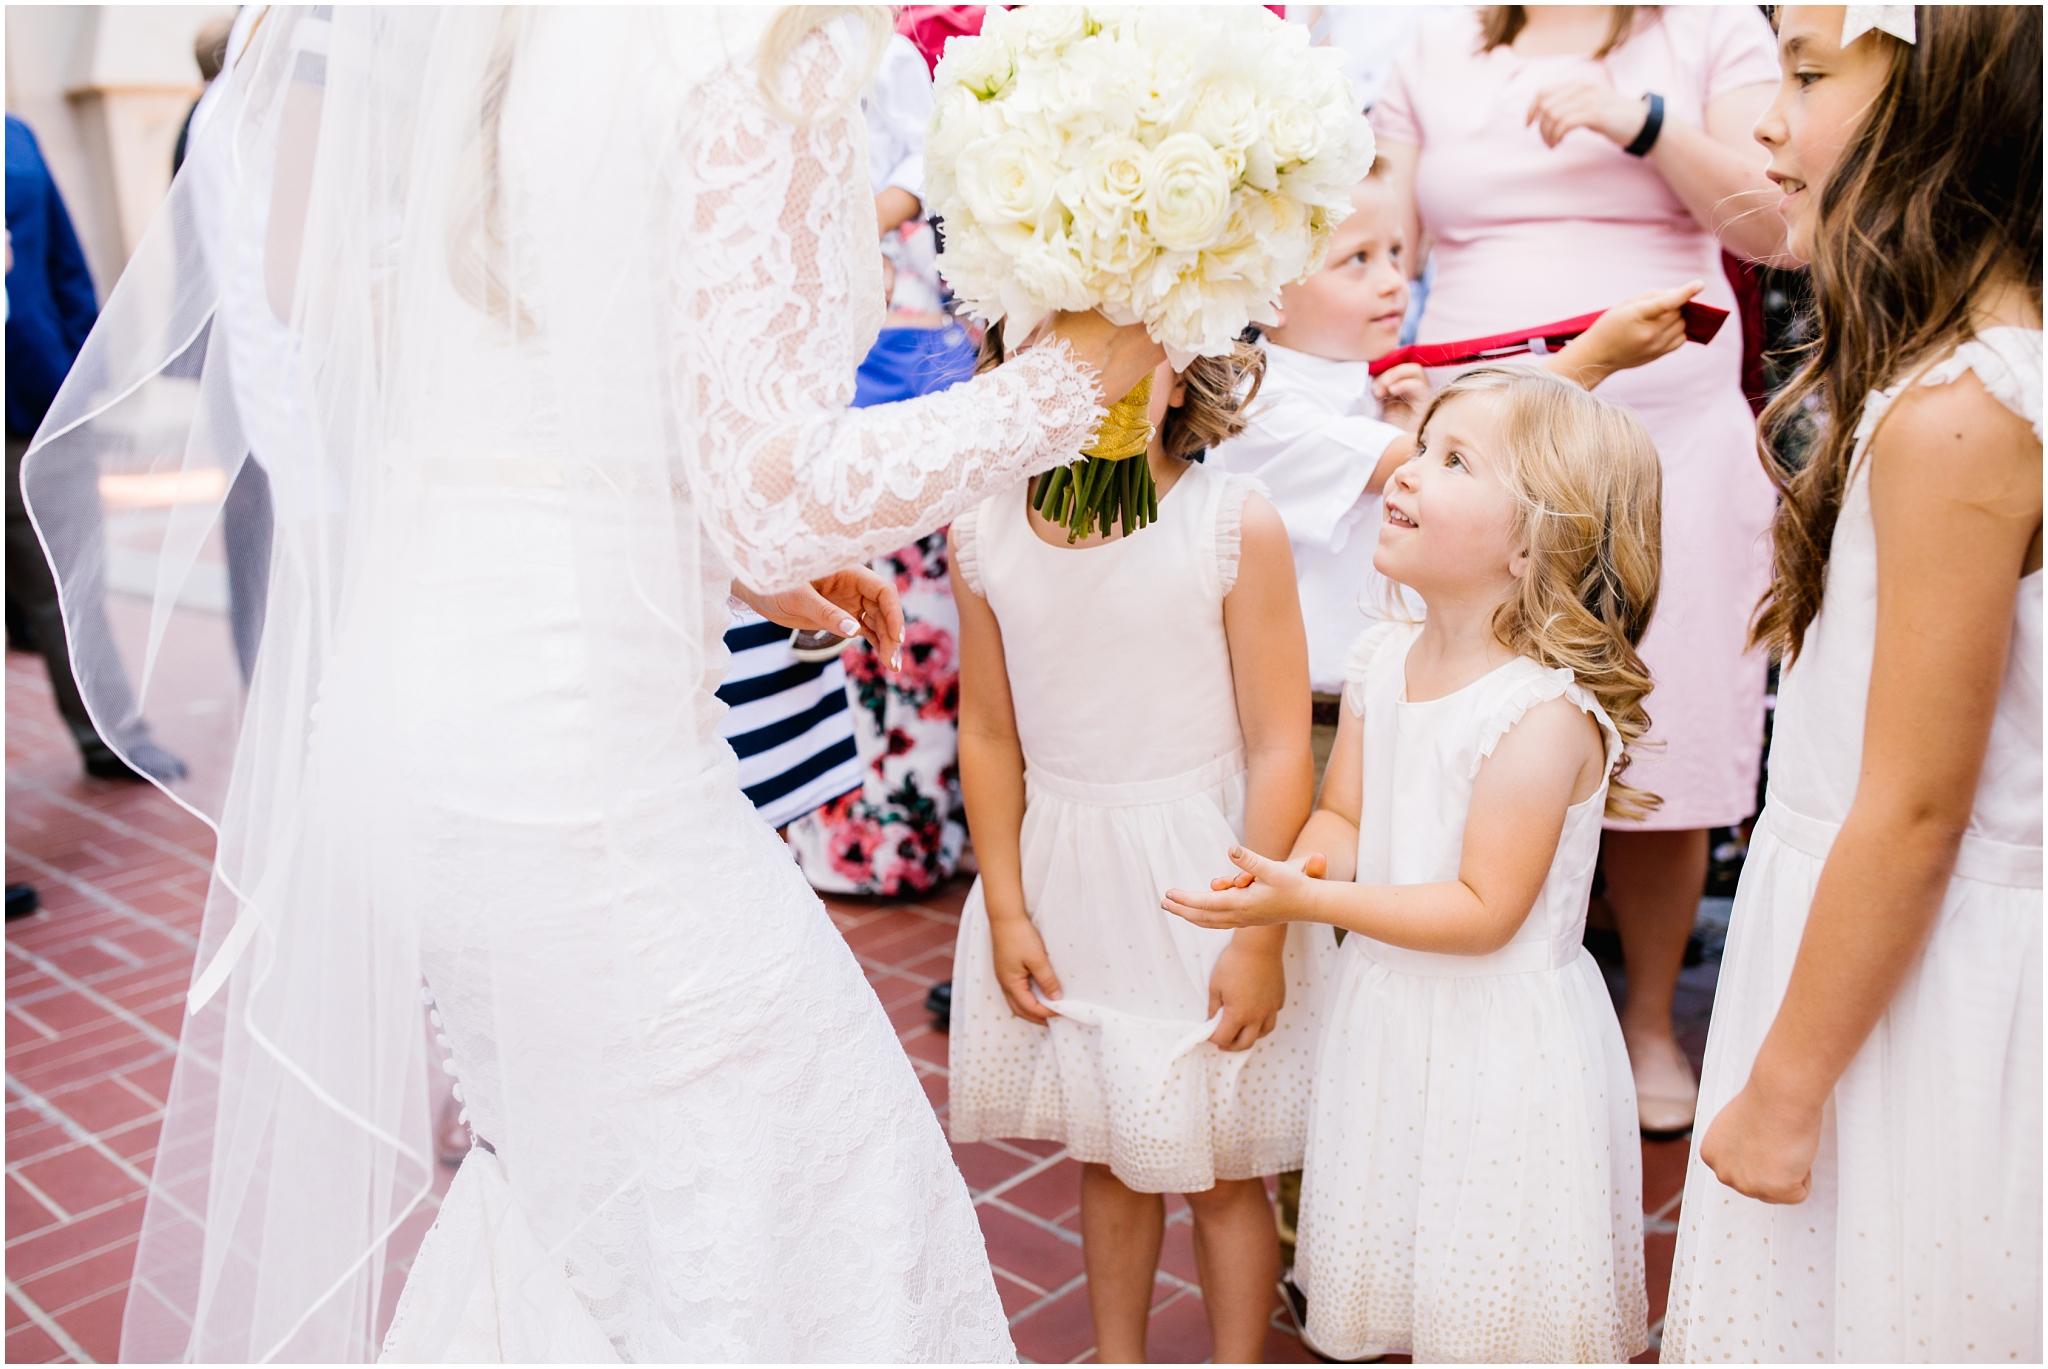 CherylandTyler-24_Lizzie-B-Imagery-Utah-Wedding-Photographer-Salt-Lake-City-Temple-Wells-Fargo-Building-Reception.jpg